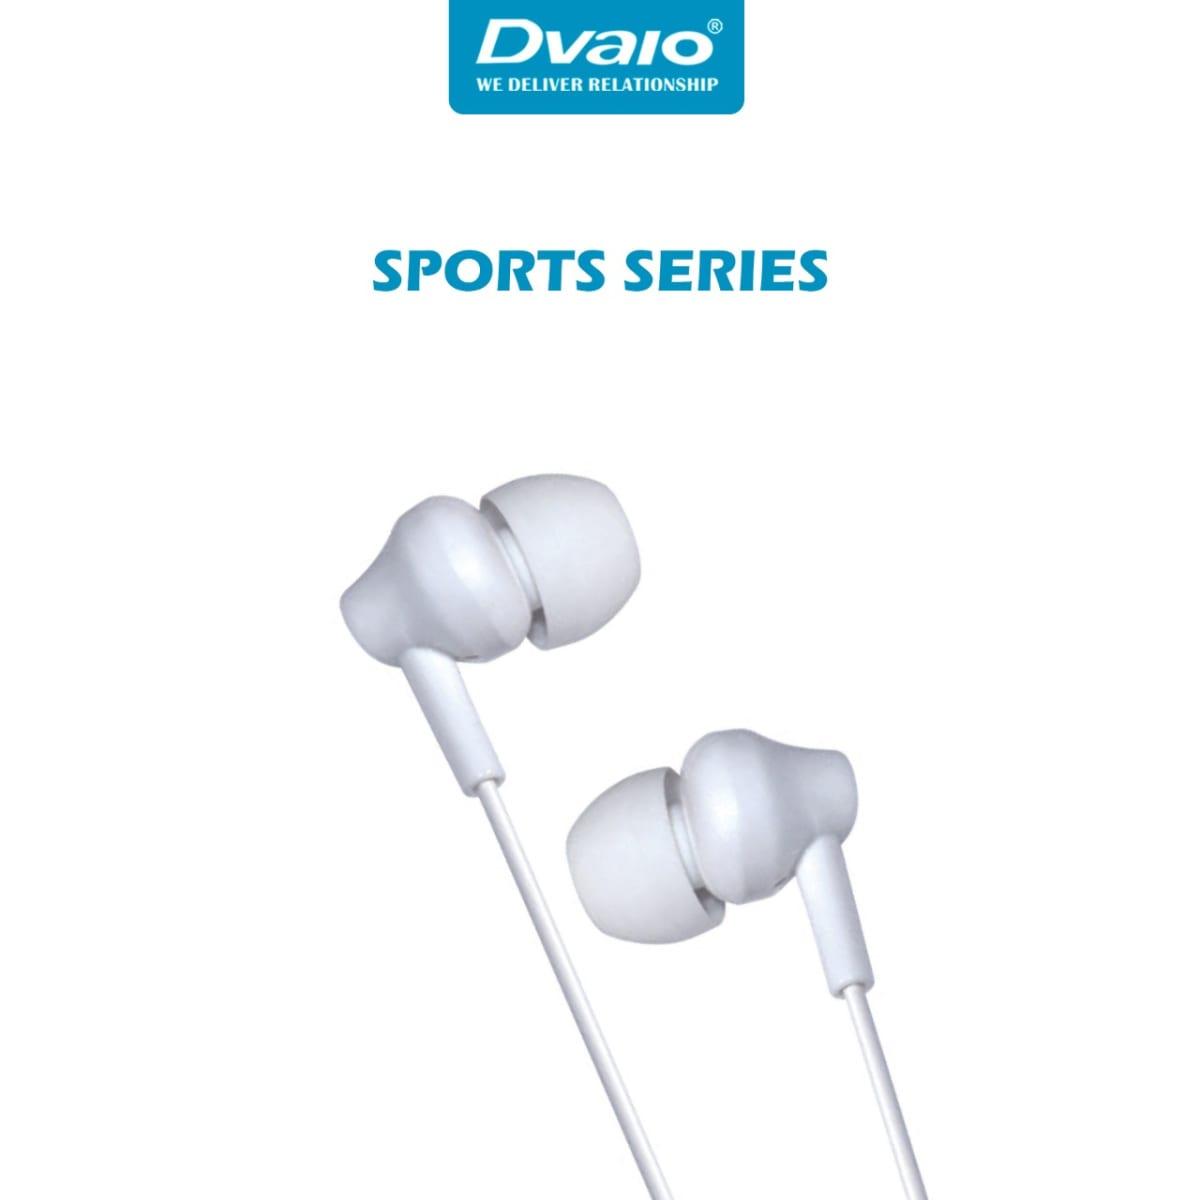 dvaio headphone with microphone